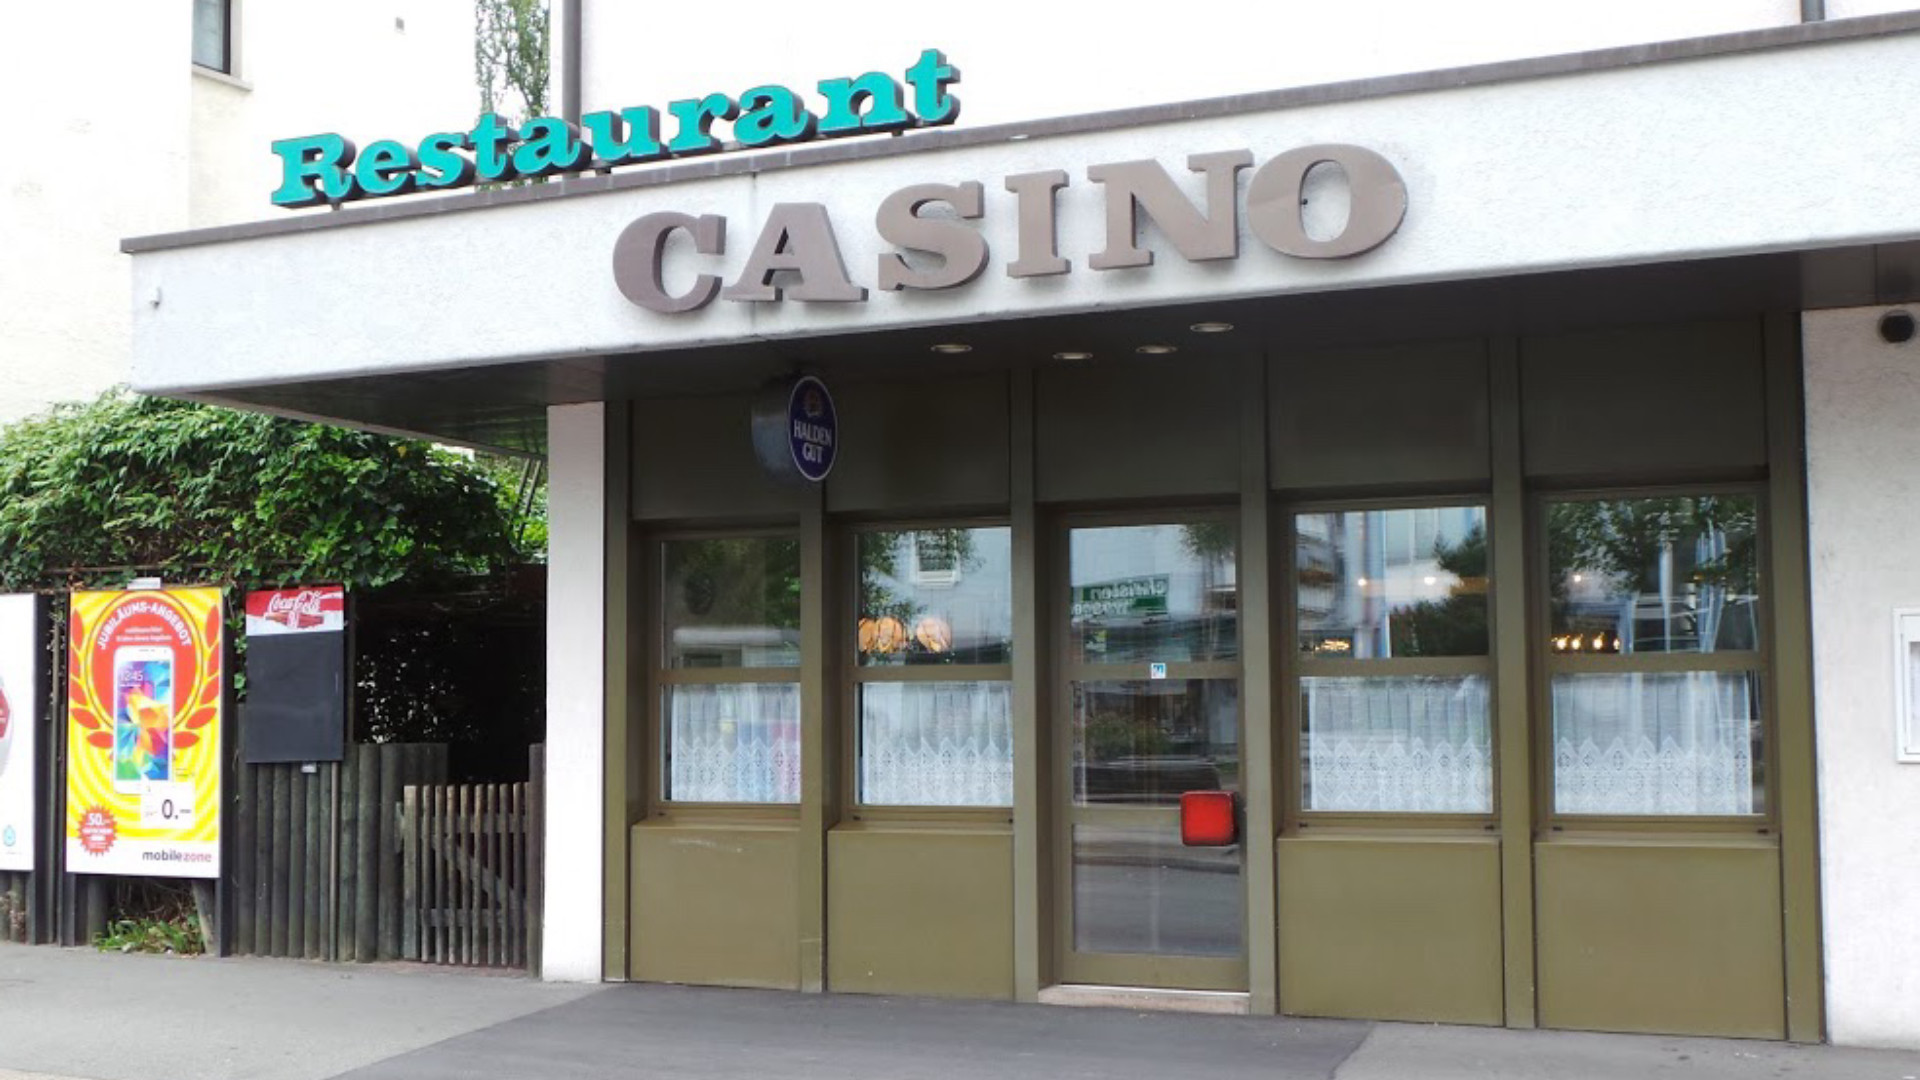 Restaurant Casino Altstetten